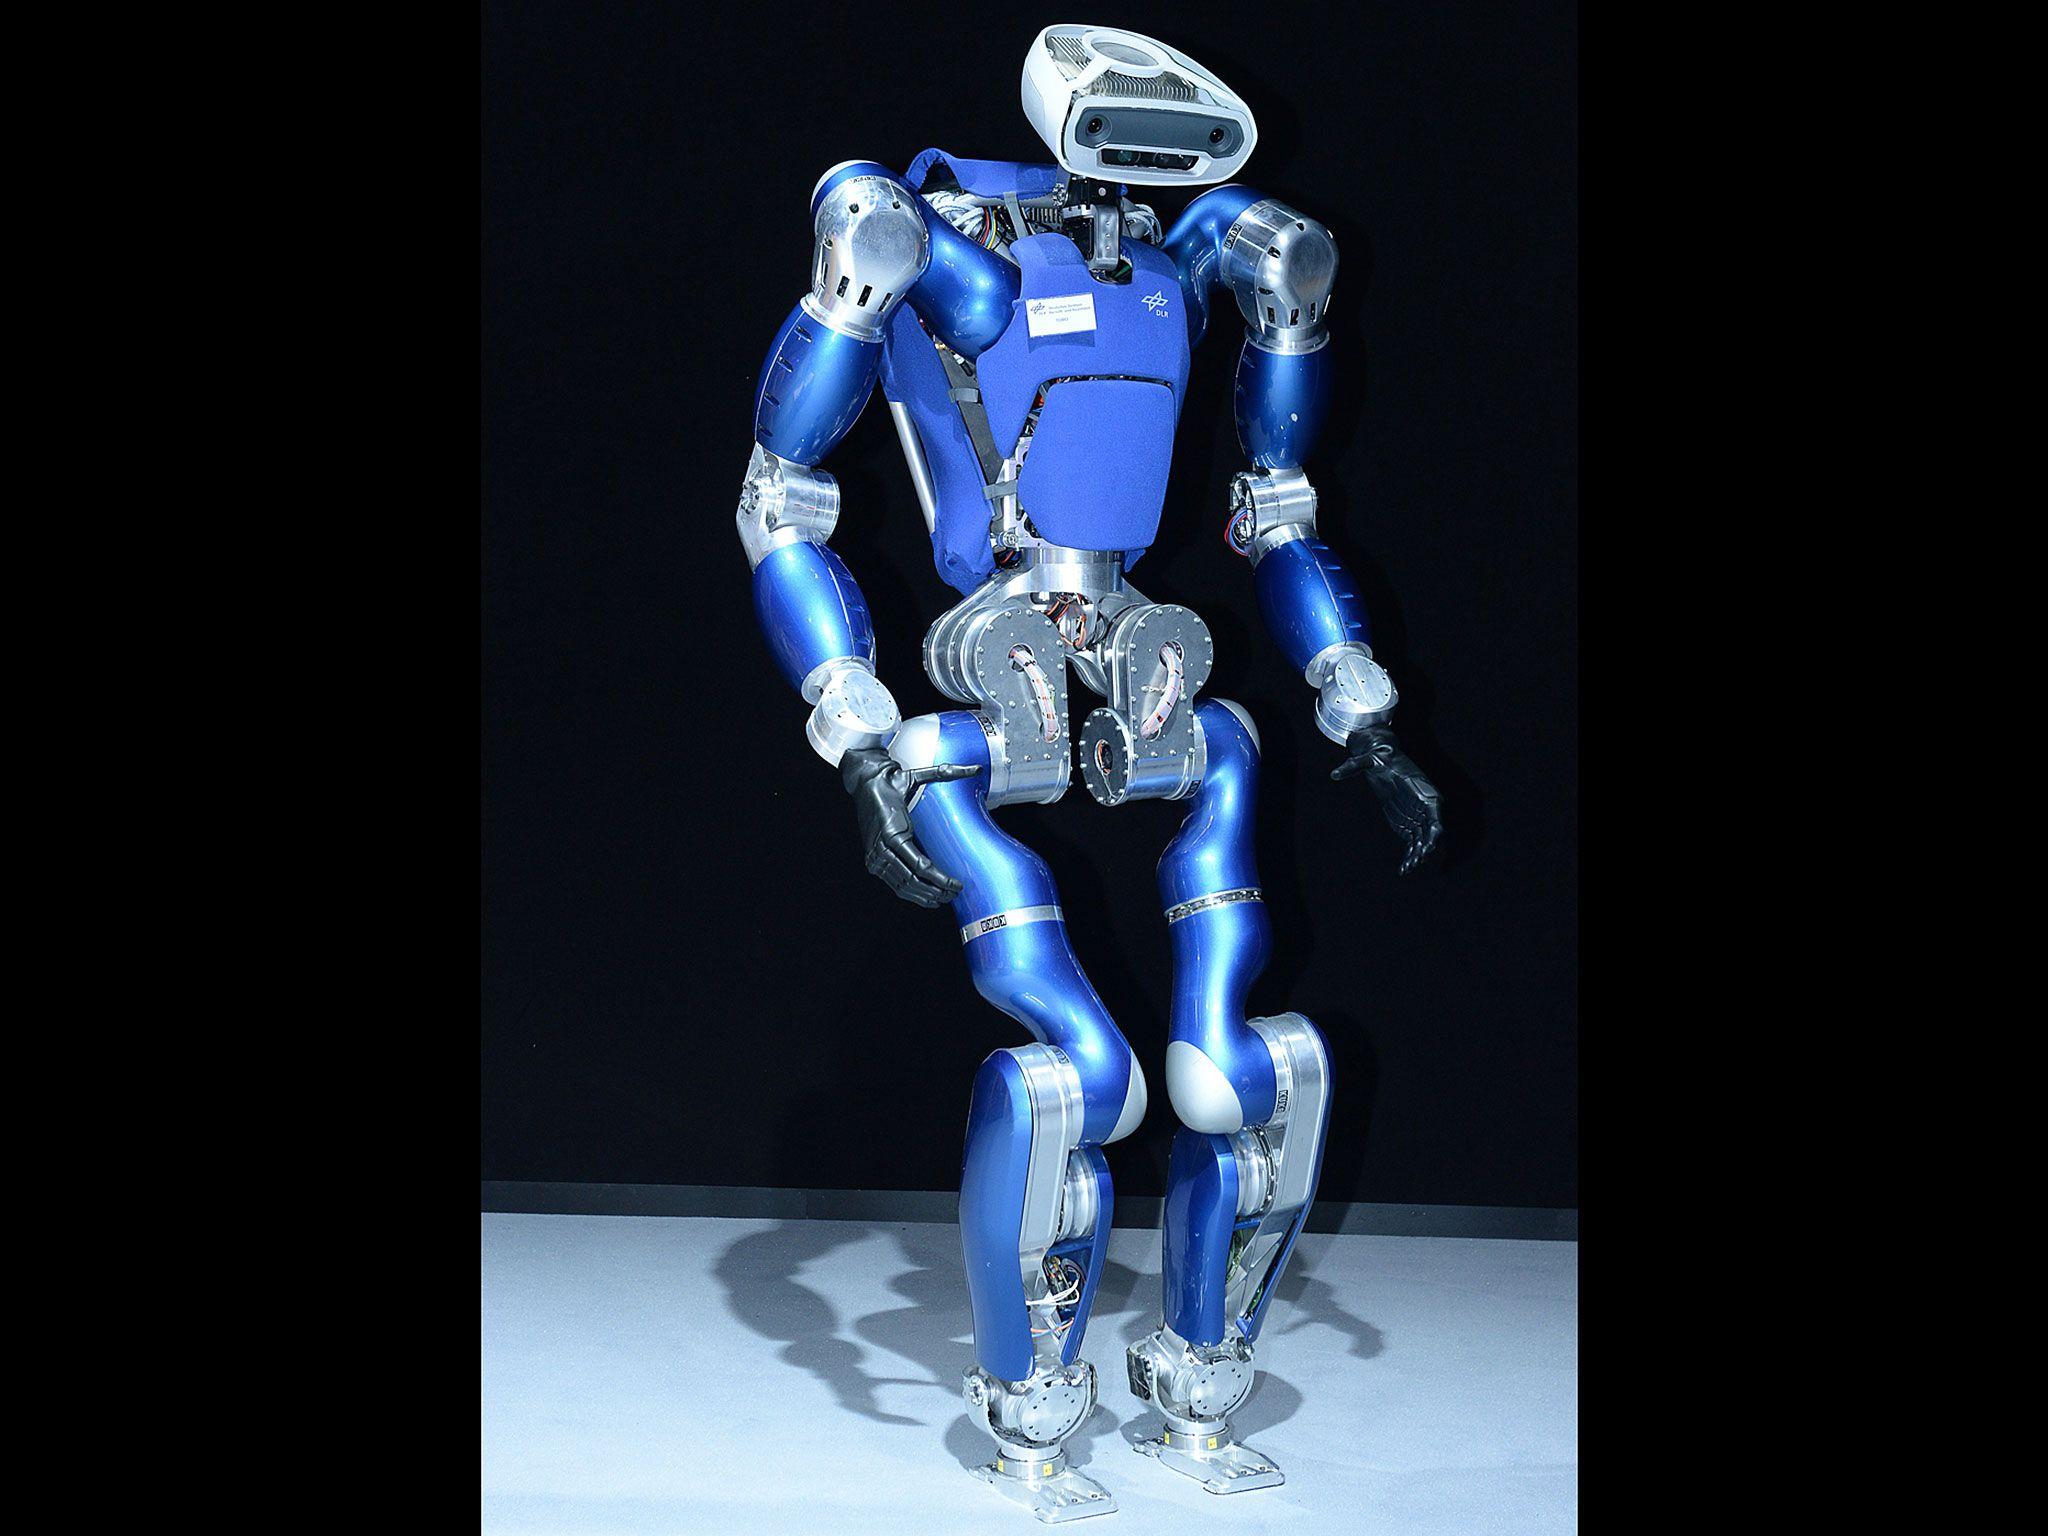 DLR Toro robot